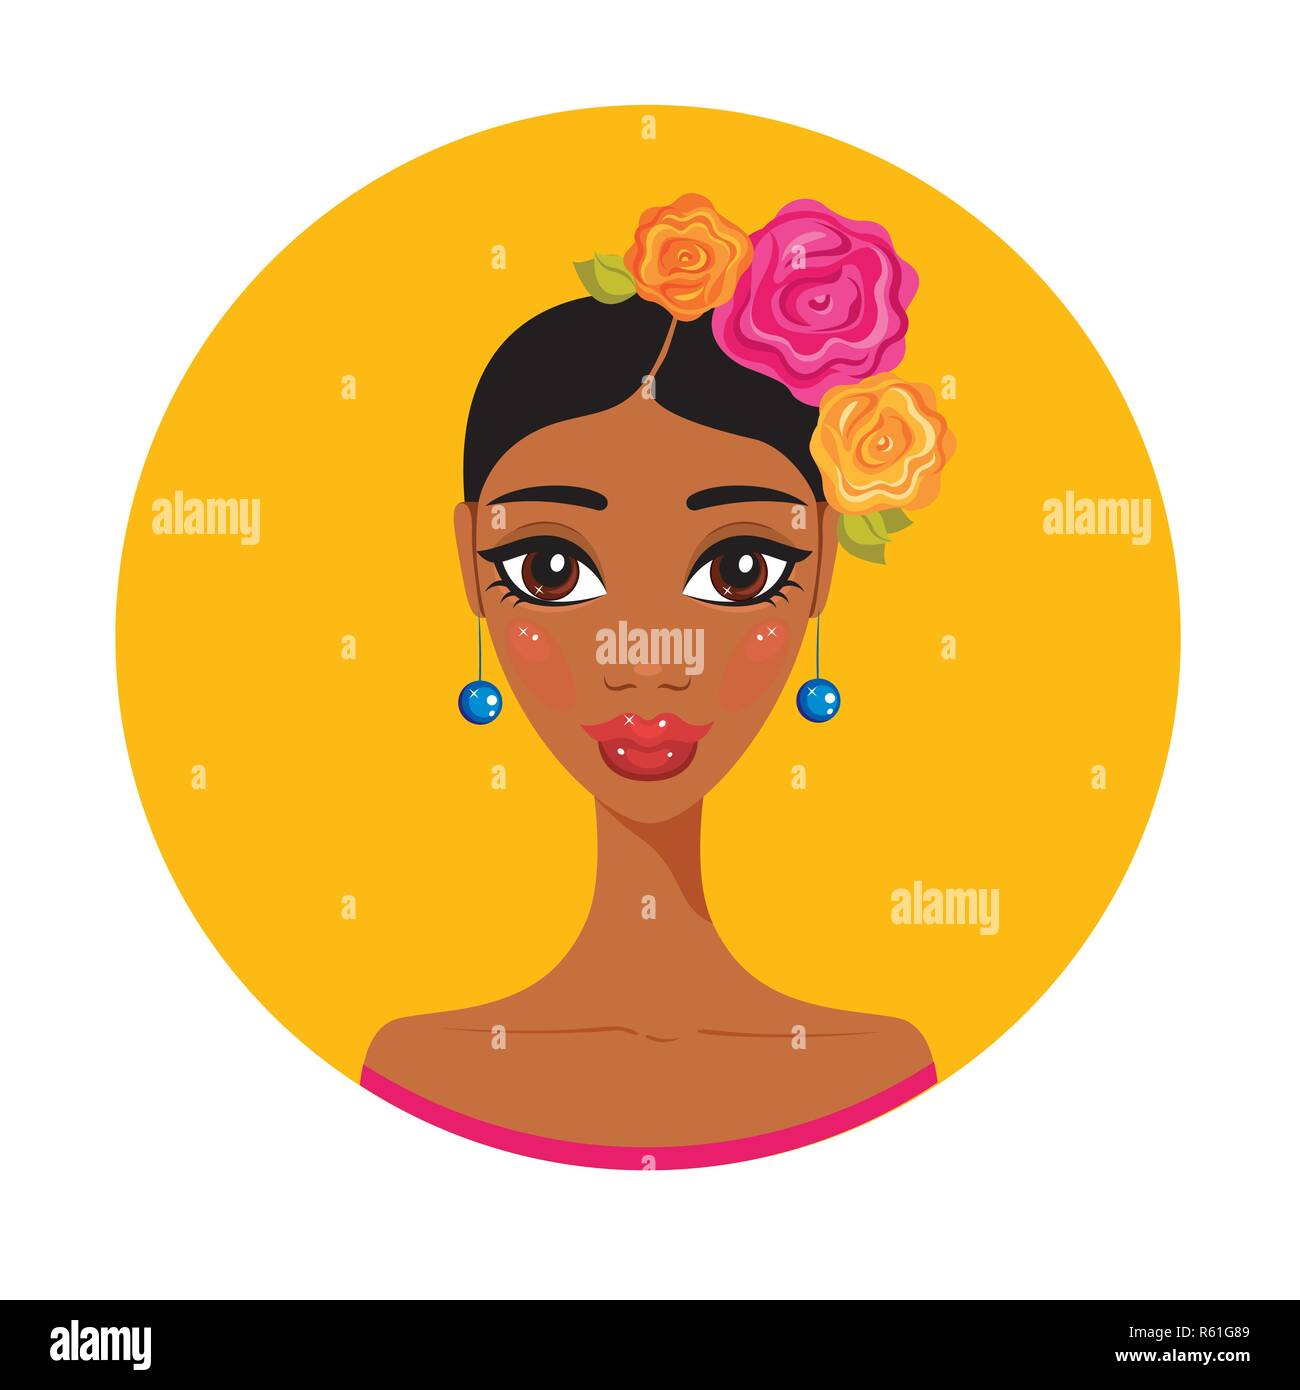 256124fe33 Hermosa joven mexicano colorido retrato de chica hispana ilustración  vectorial Imagen De Stock